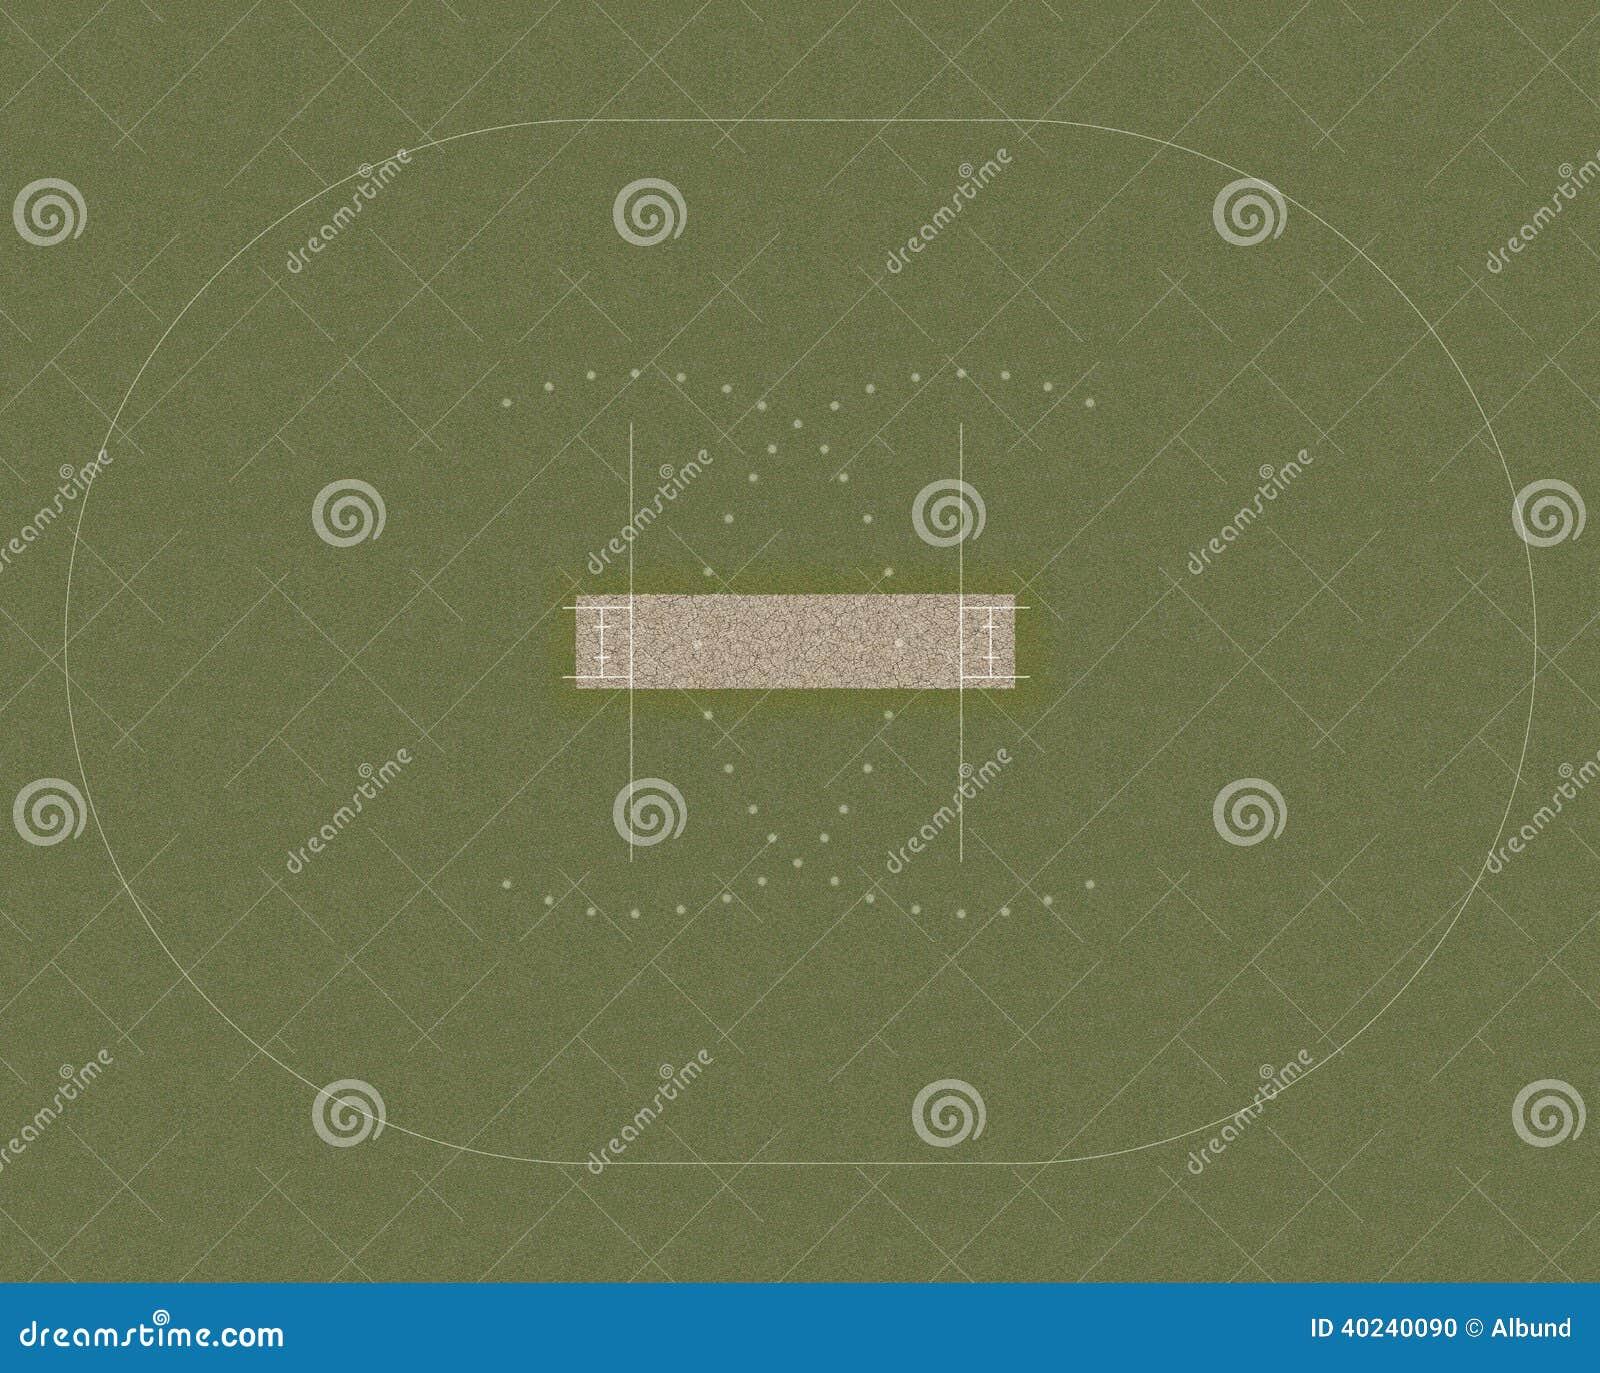 Cricket Field Layout Illustration 40240090 Megapixl